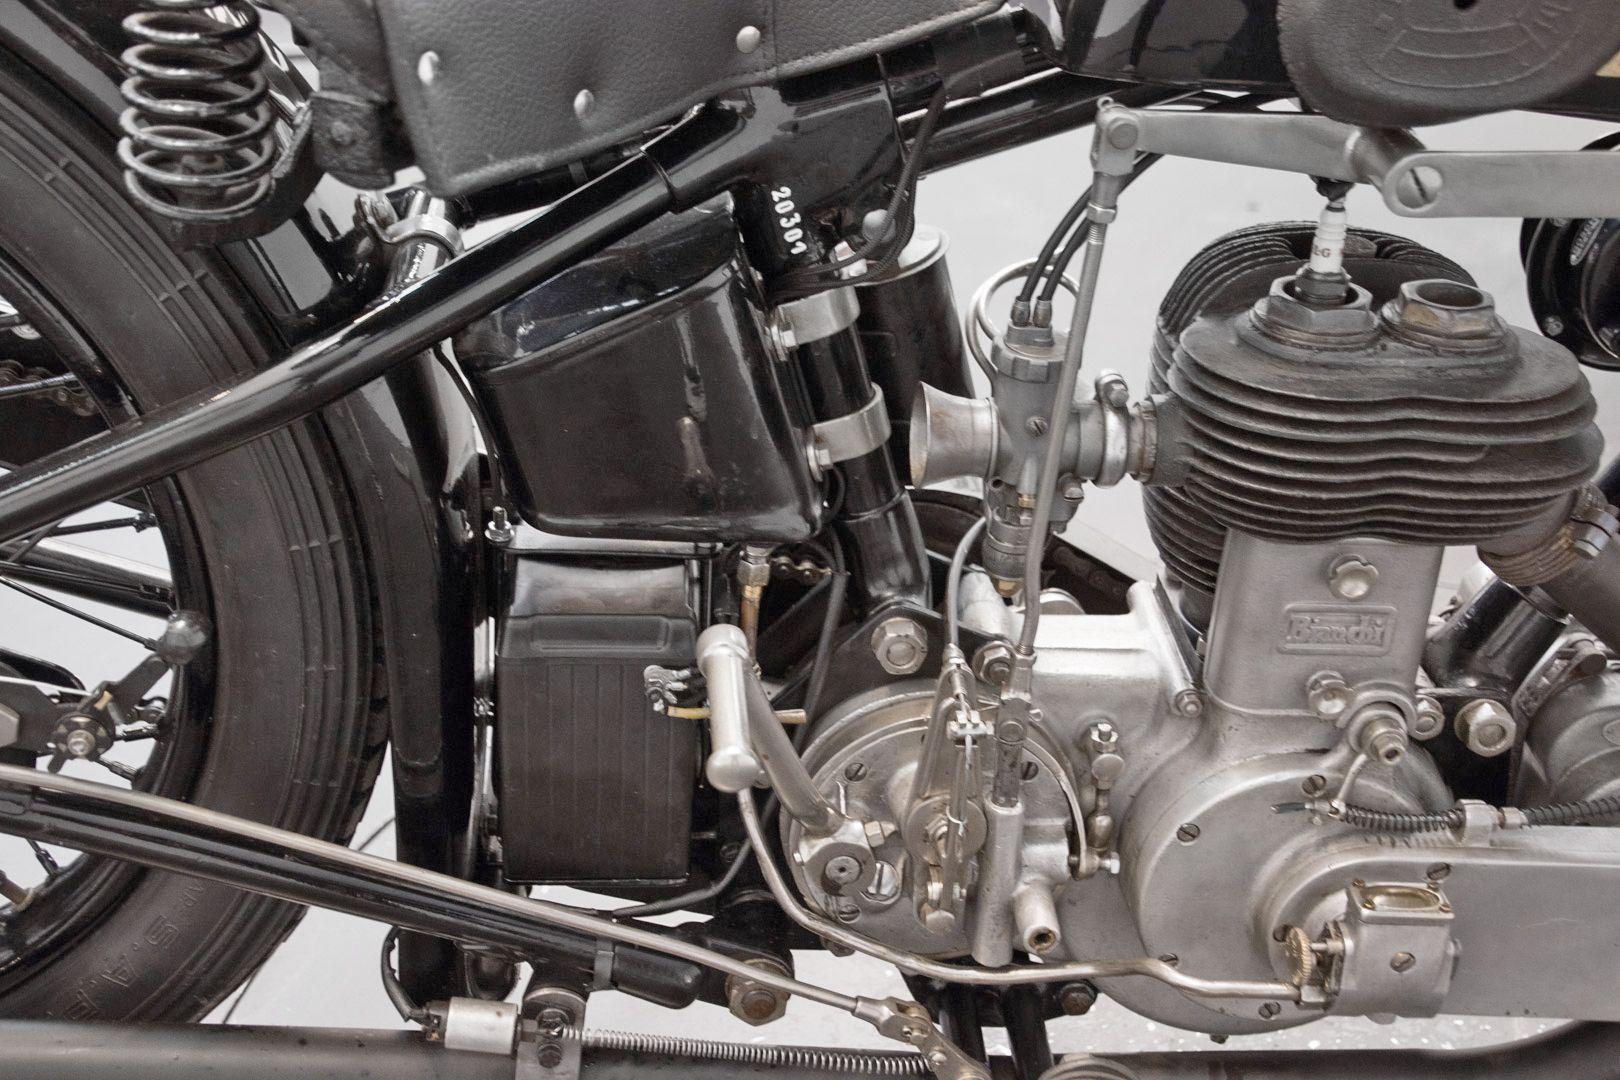 1940 Bianchi 350 34335